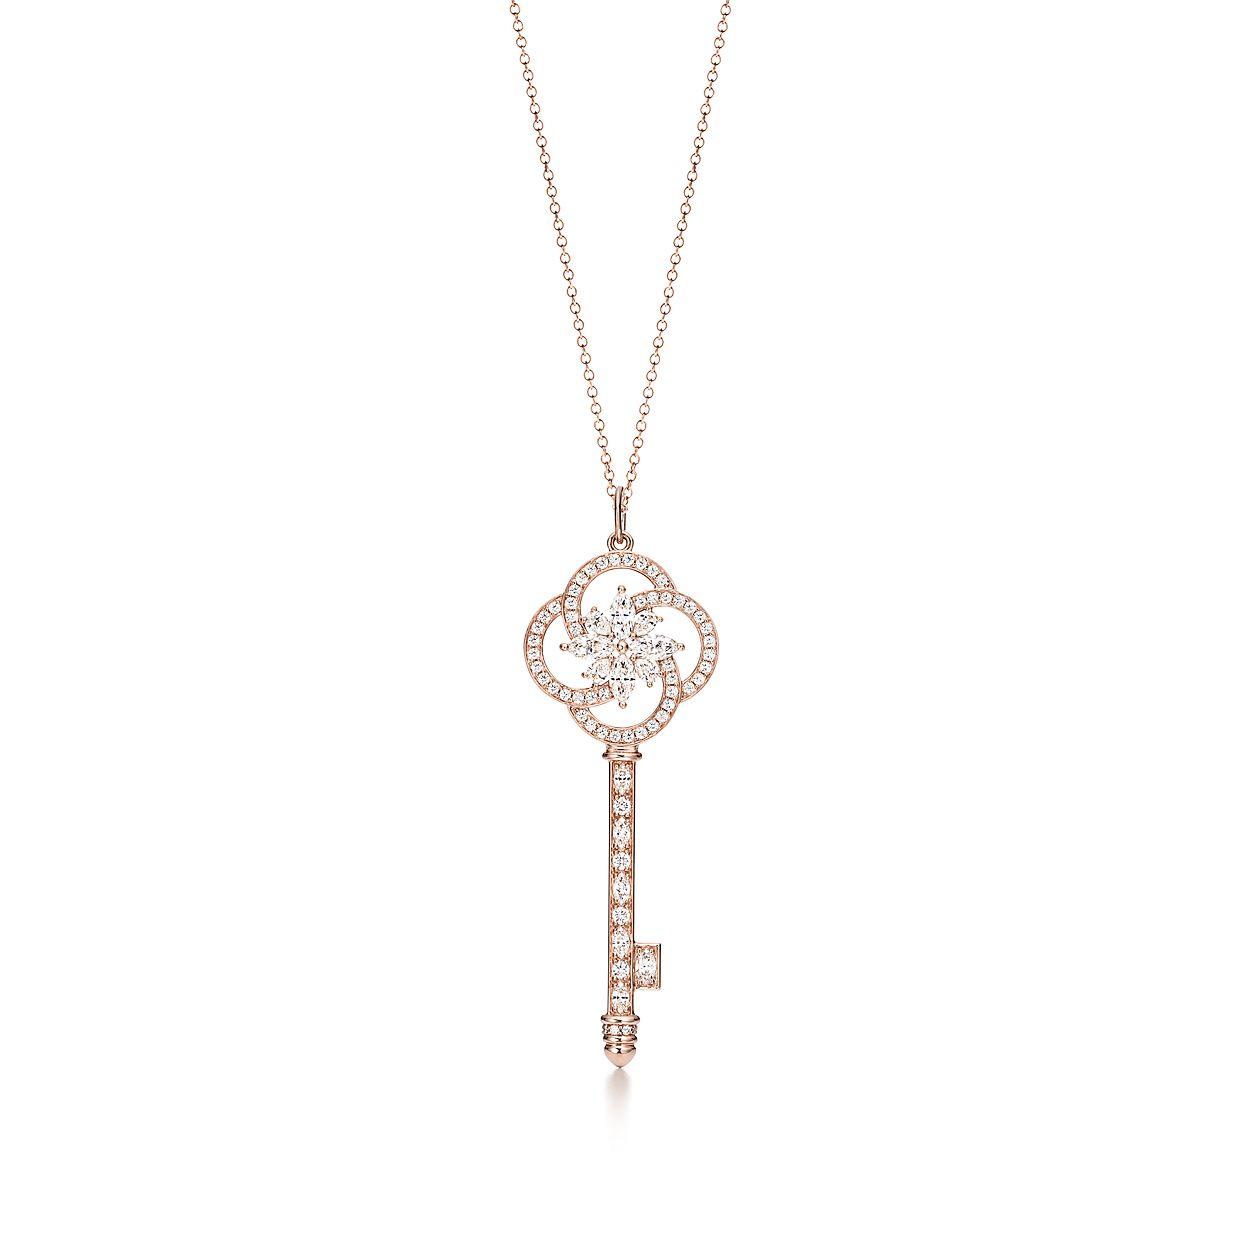 Tiffany Keys floral key pendant in 18k white gold with diamonds Tiffany & Co. 9CmQMY